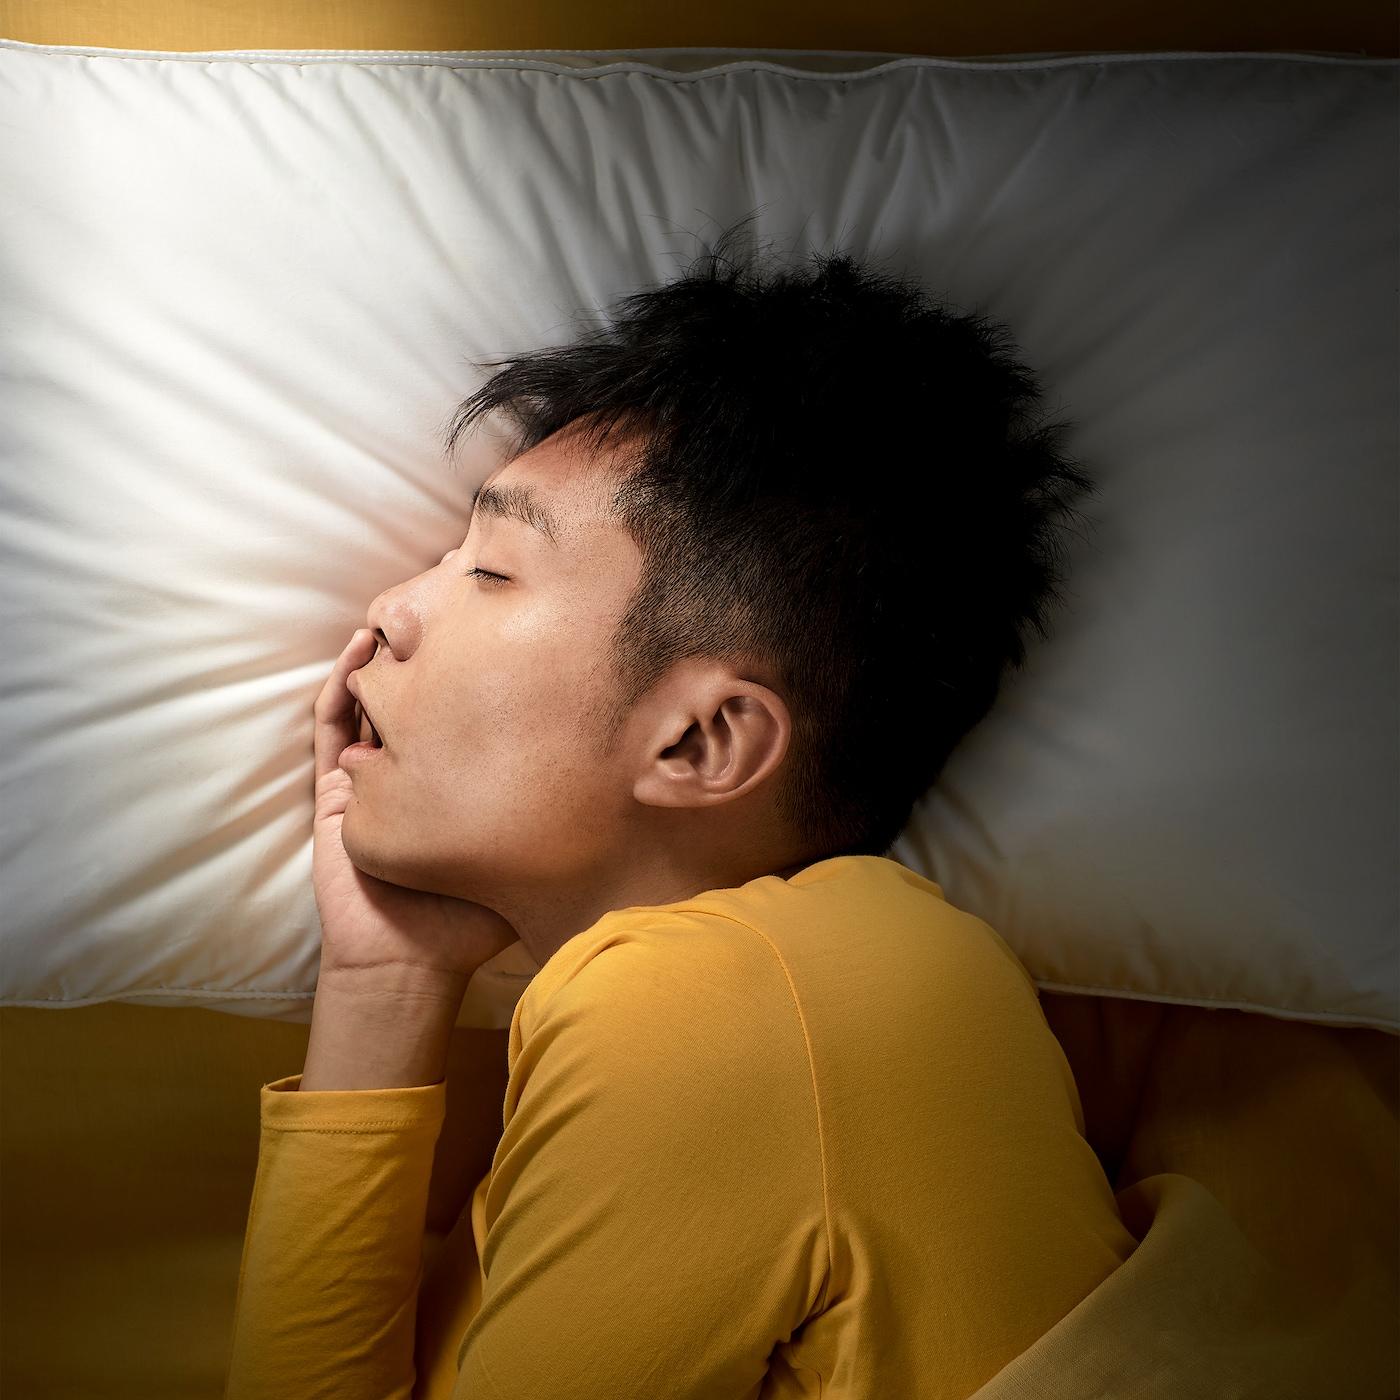 IKEA PRAKTVÄDD 프락트베드 인체공학적 베개를 베고 옆으로 누워 곤히 잠든 남성